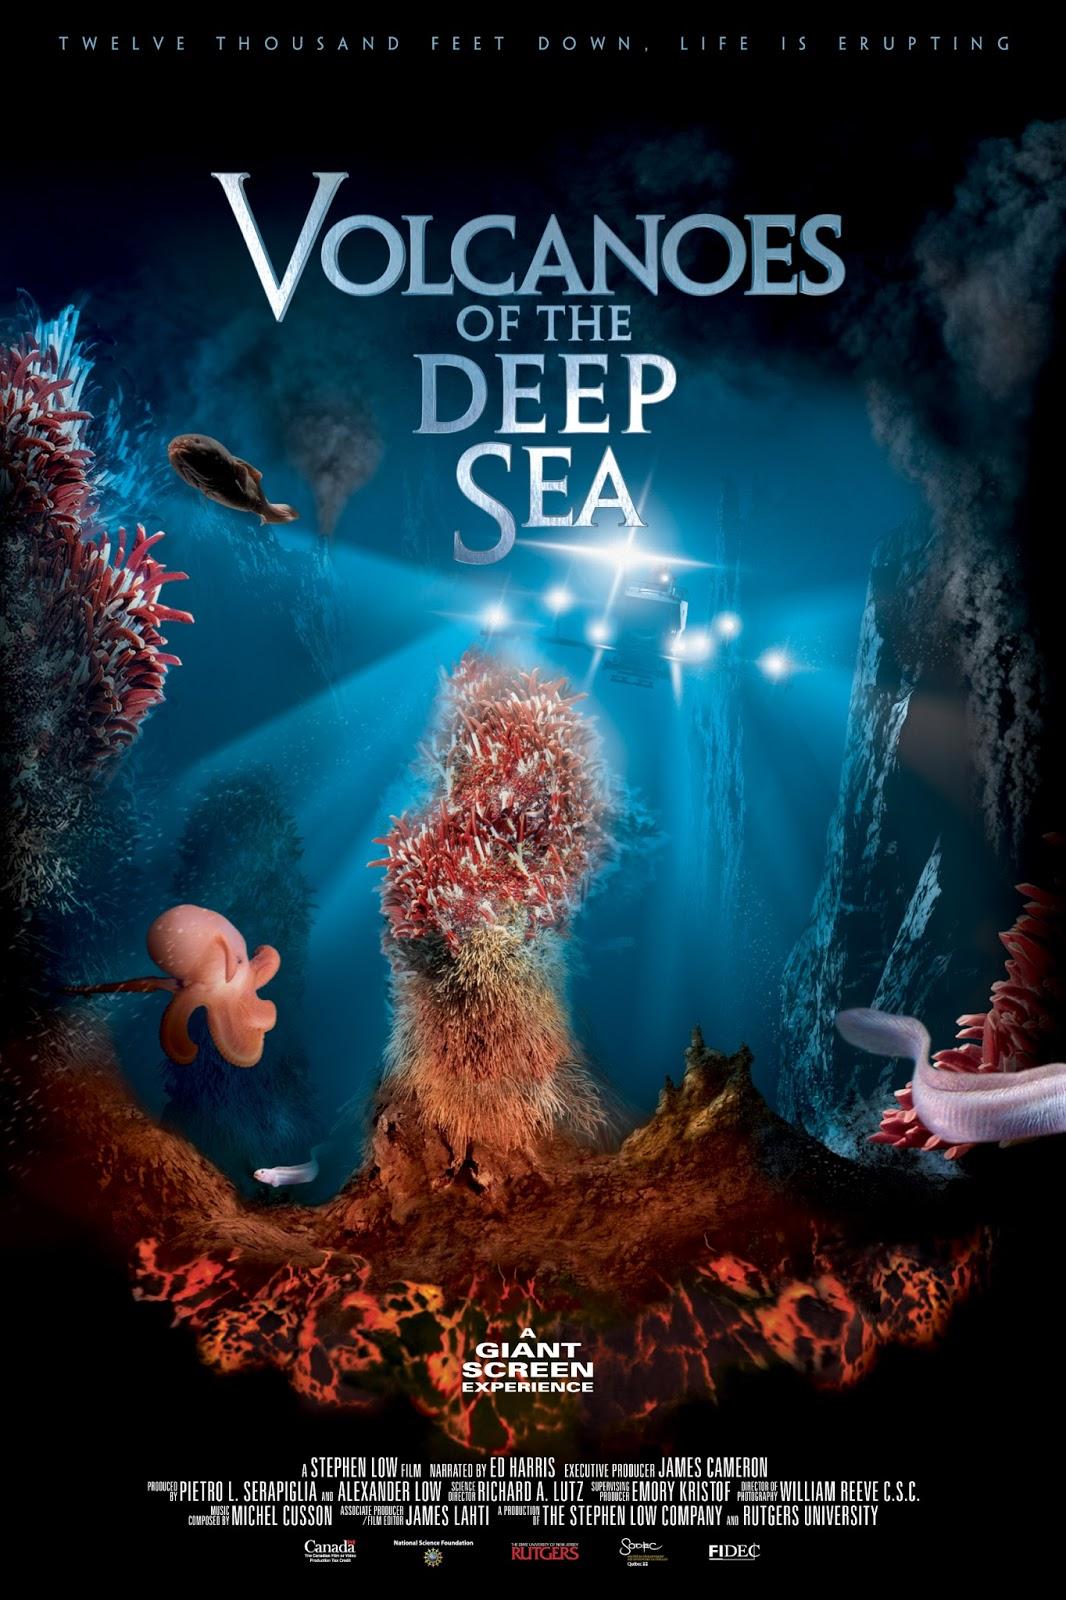 Volcanoes of the Deep Sea (2003) ταινιες online seires oipeirates greek subs